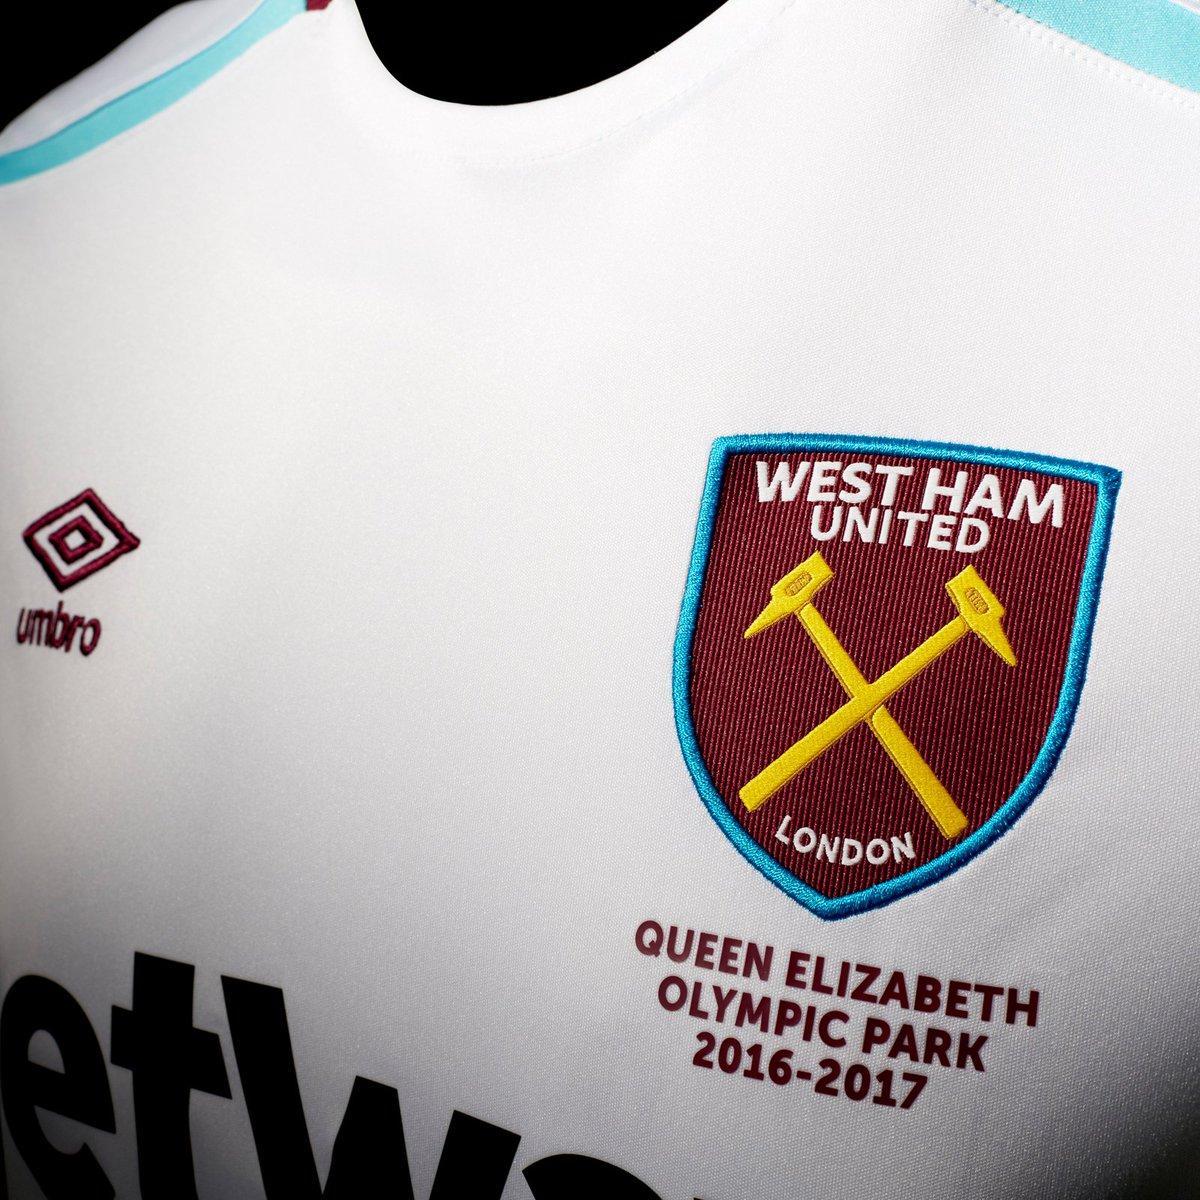 8b3b6a8f19a West Ham United on Twitter